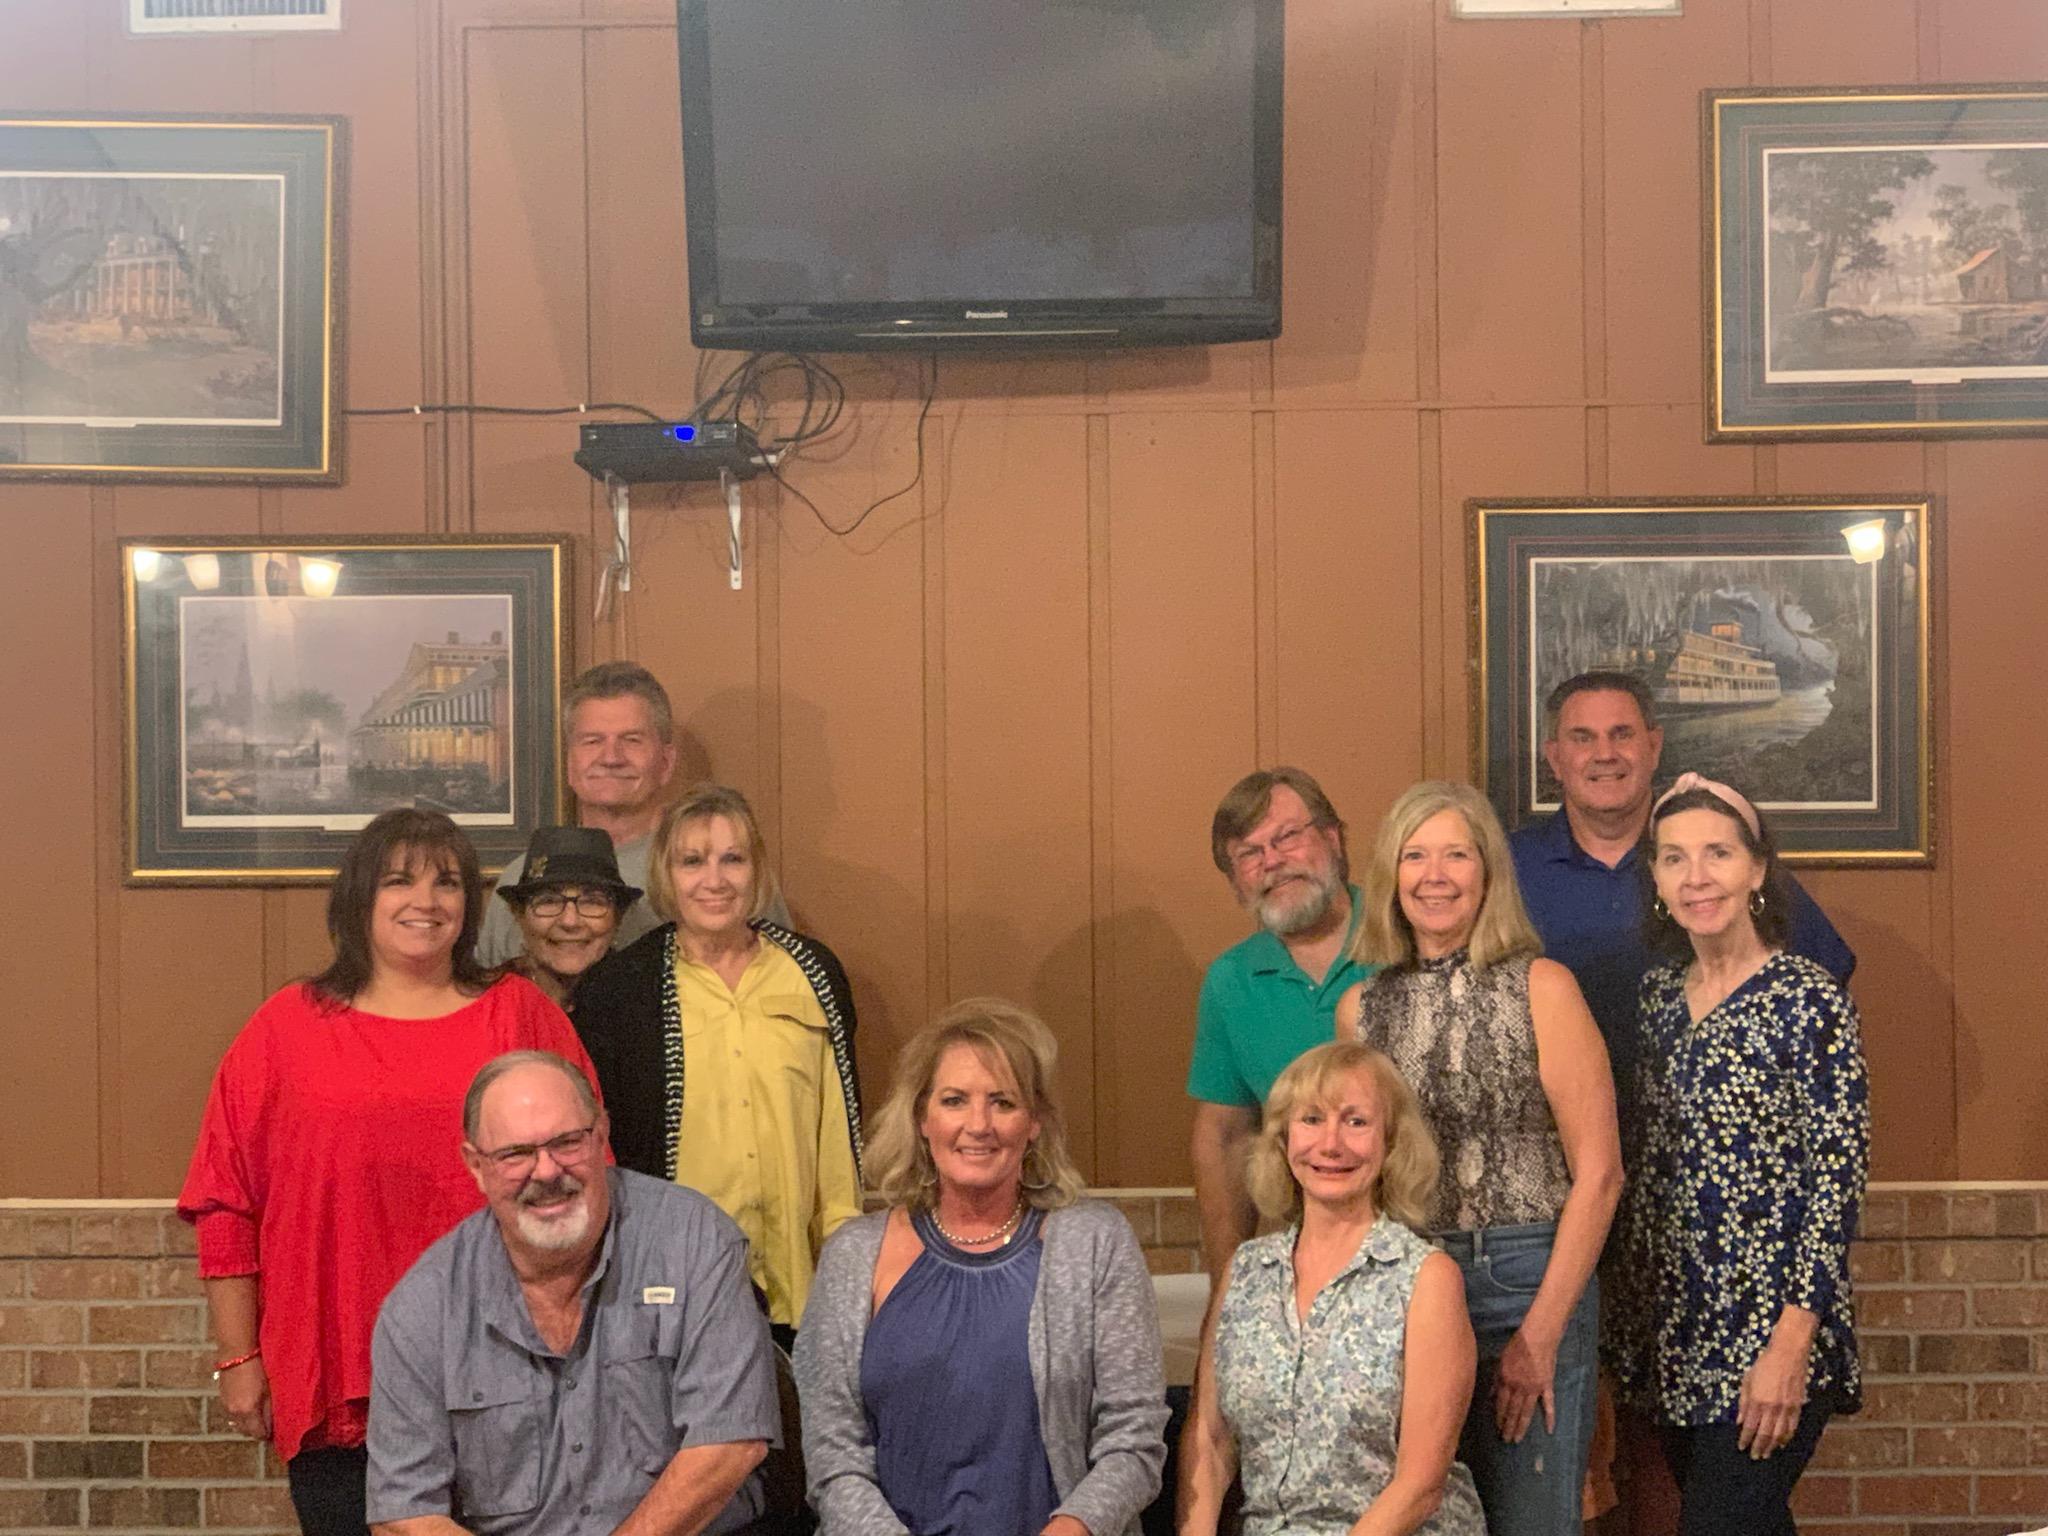 10-13-2021 Board Meeting